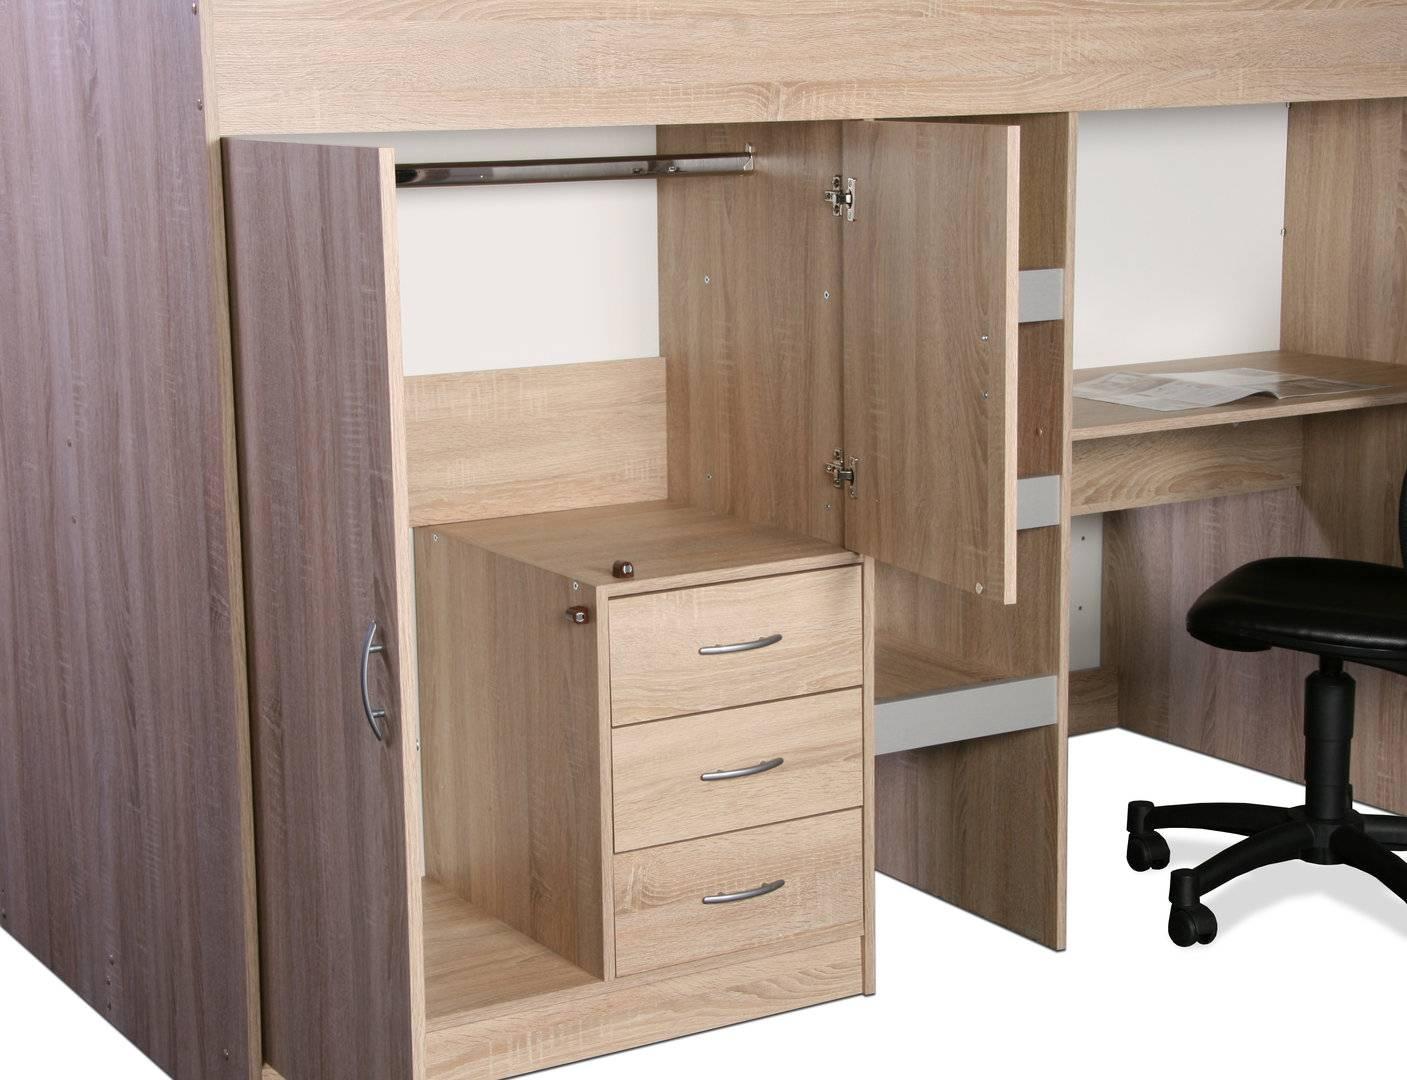 Brighton High Cabin Sleeper Bed Oak And Grey - Rutland Furniture for High Sleeper Wardrobes (Image 1 of 15)